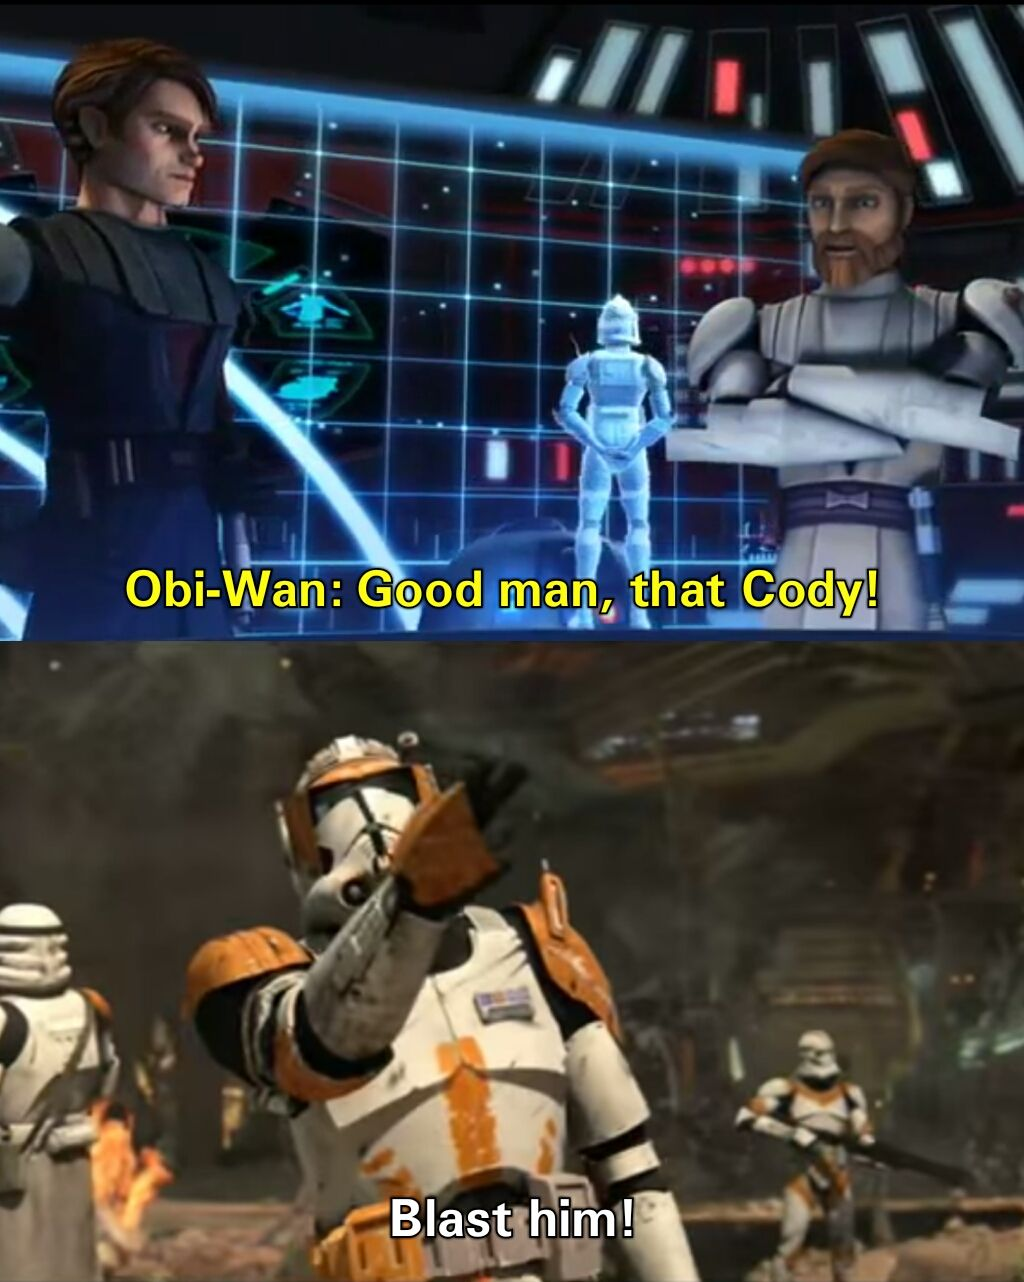 Clone Wars Meme Cody Obi Wan Star Wars Memes Star Wars Jokes Star Wars Facts